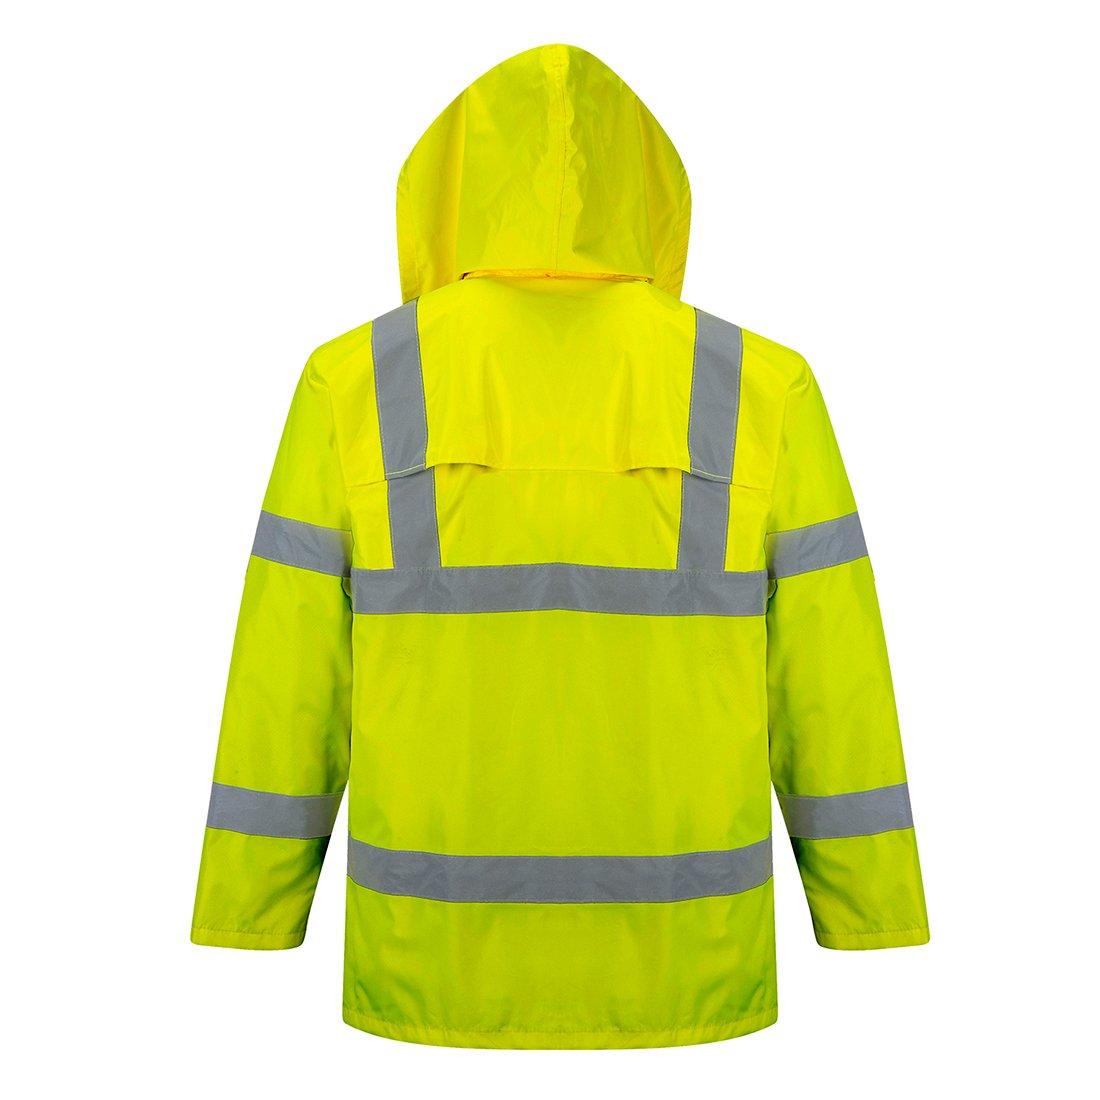 Portwest Waterproof Rain Jacket, Lightweight, Yellow, Medium by Portwest (Image #3)